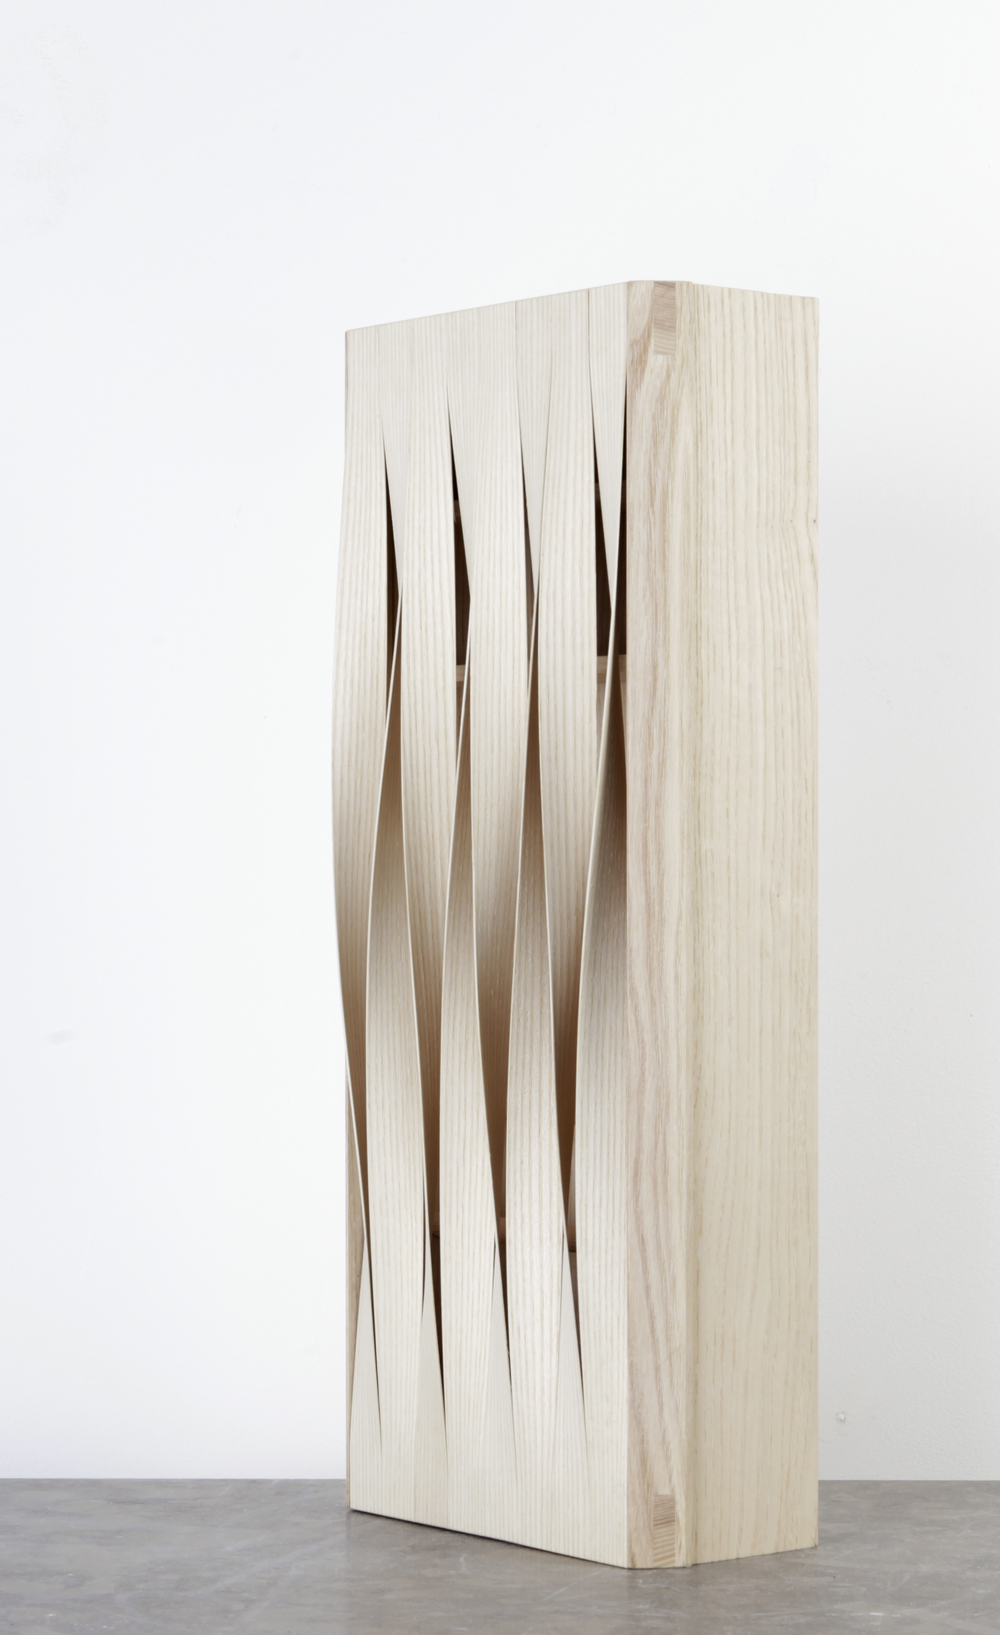 Cabinet Luftig Small- Charlie Styrbjörn Nilsson - Olle K Engberg - Ludwig Berg (25).jpg